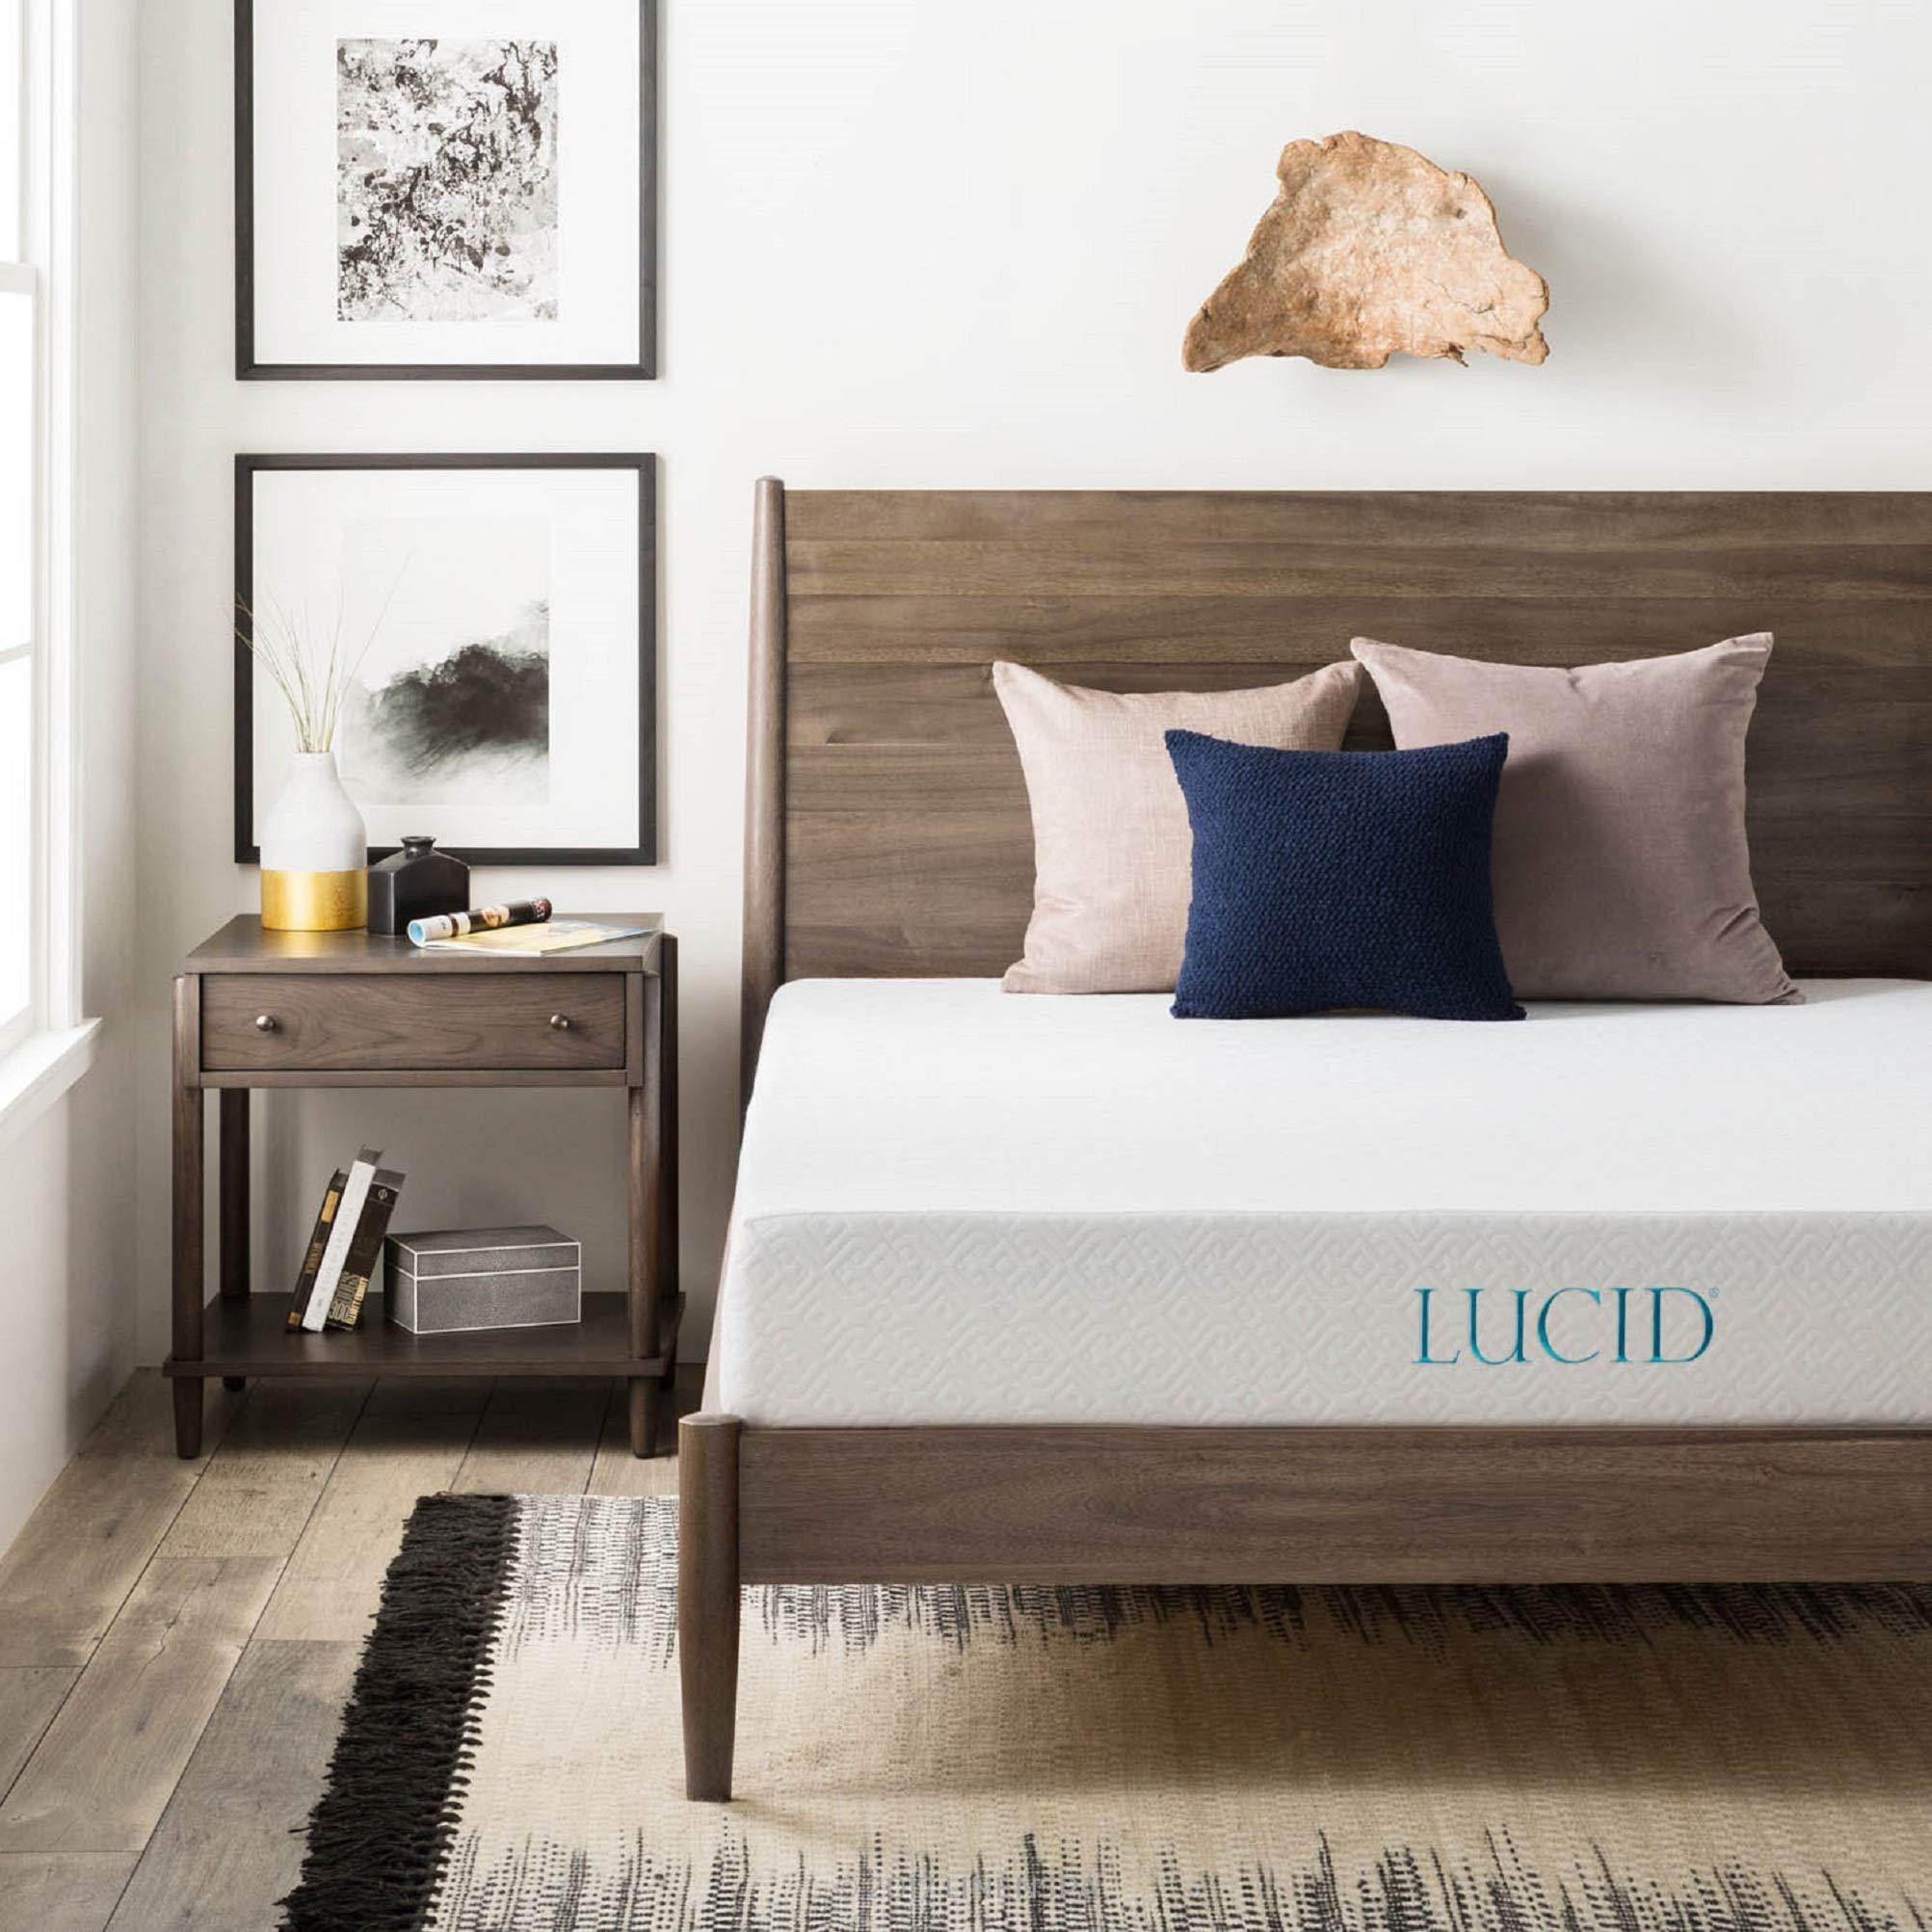 LUCID 8 Inch Gel Infused Memory Foam Mattress - Medium Firm Feel - CertiPUR-US Certified - 10-Year warranty - Queen by LUCID